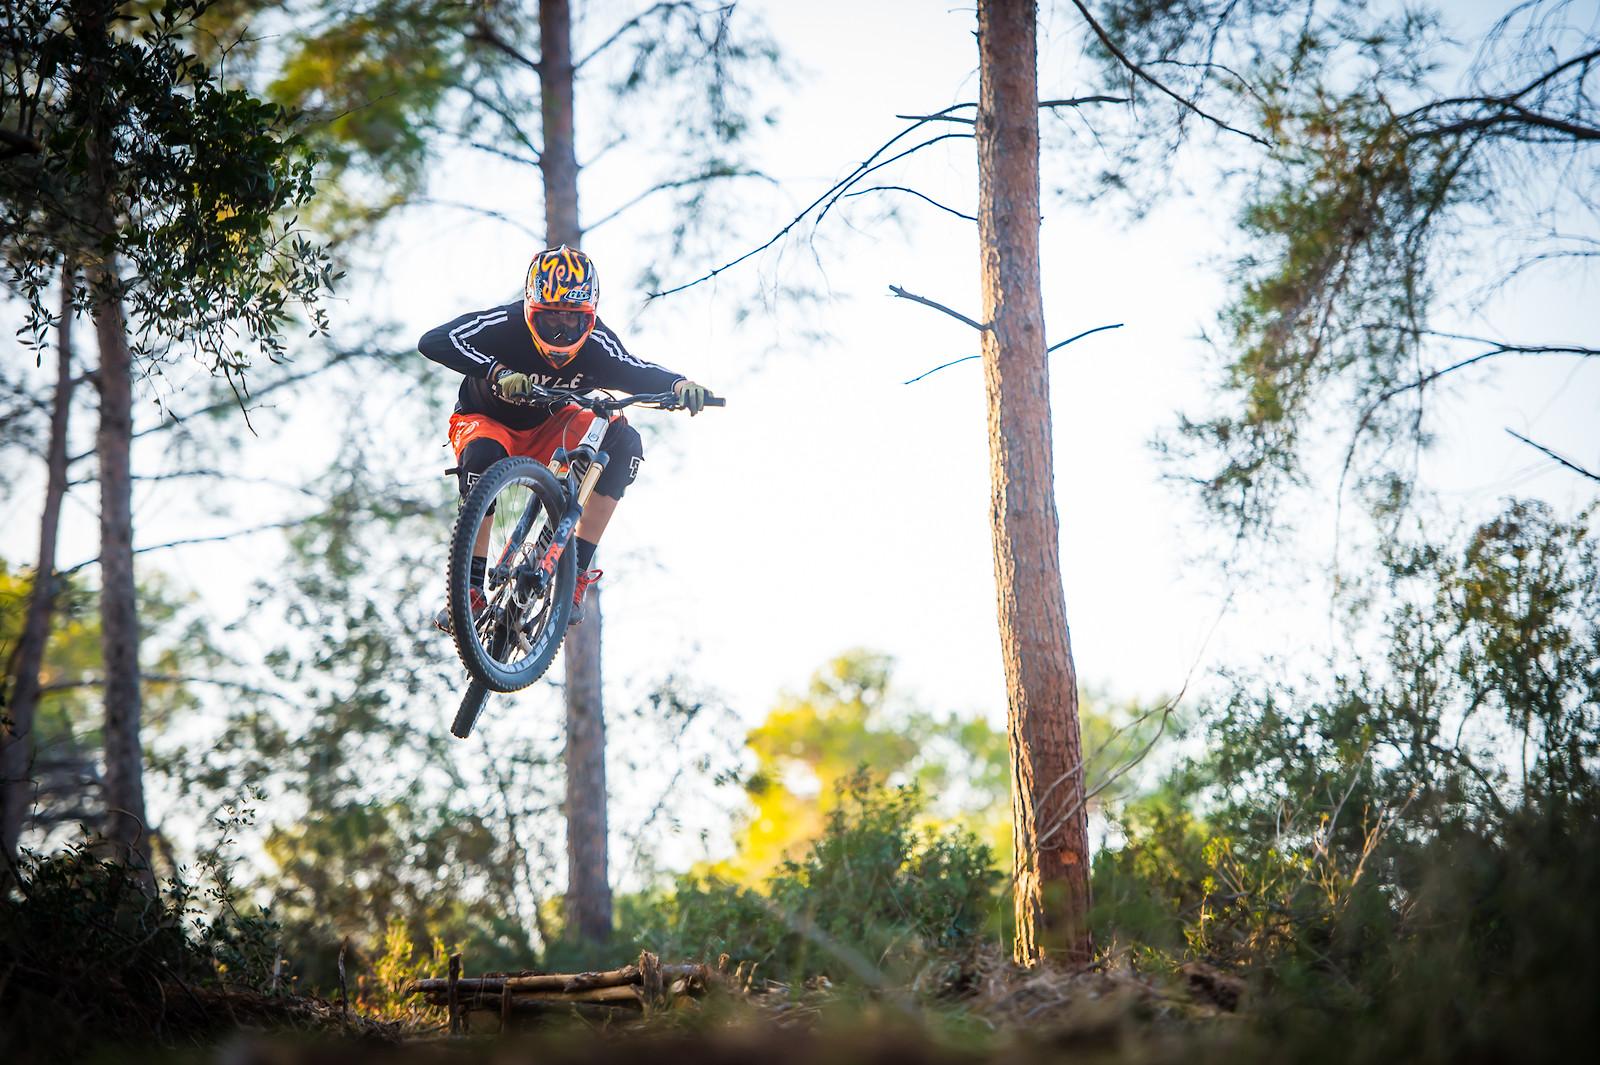 Sunset Fun - iceman2058 - Mountain Biking Pictures - Vital MTB